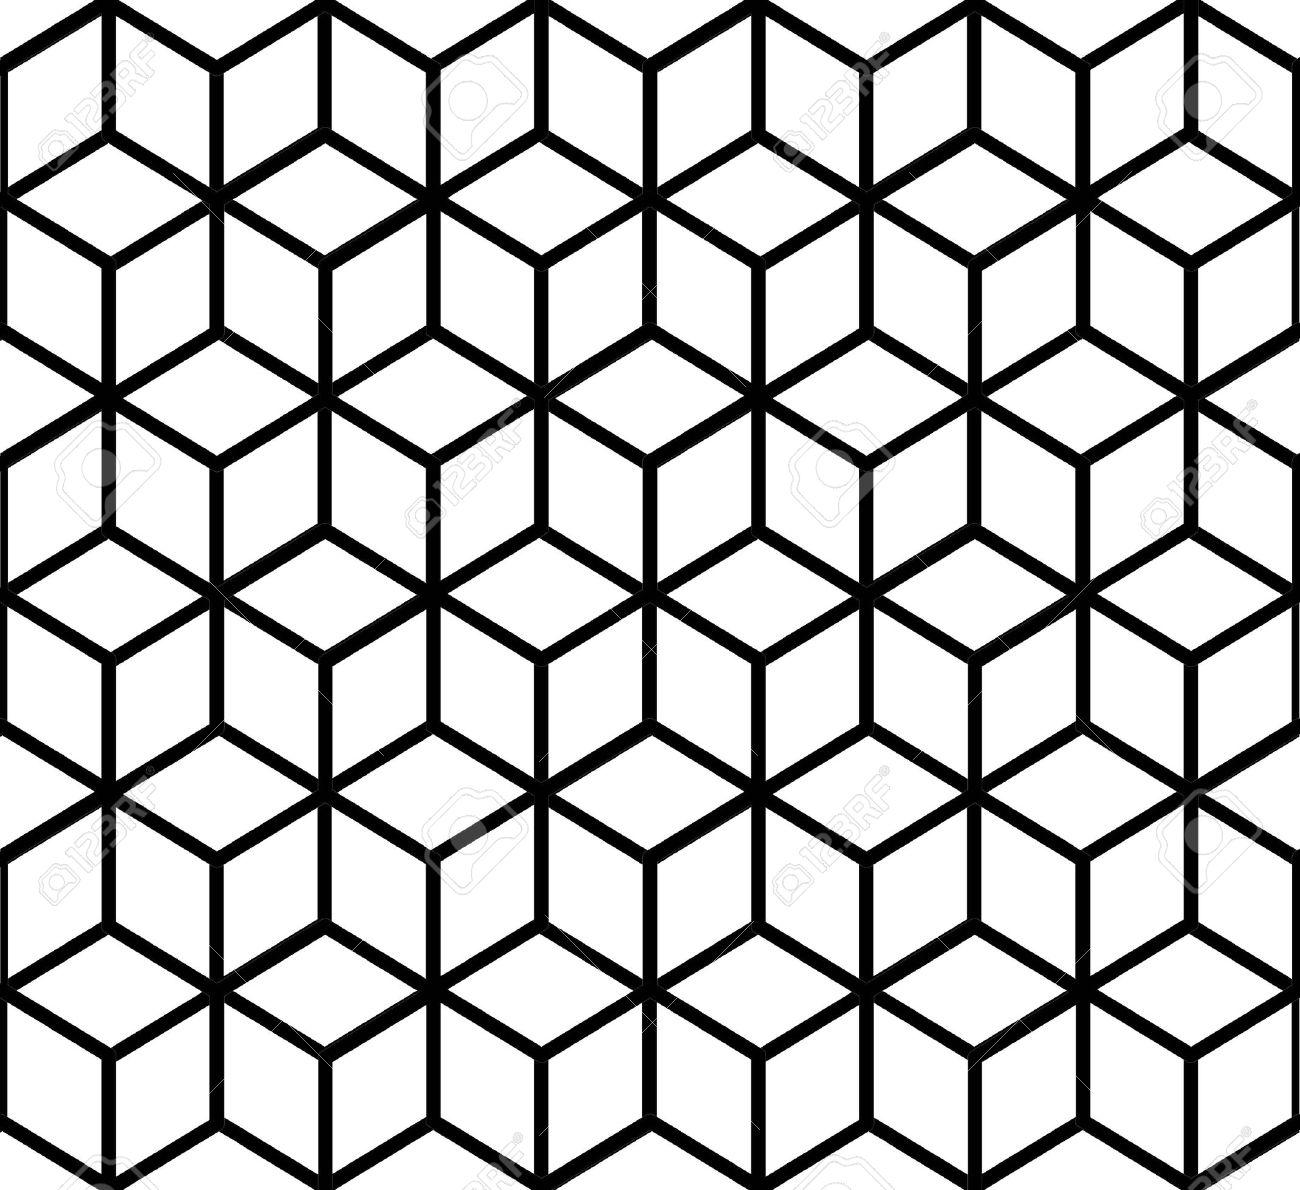 Geometrische Muster 3d